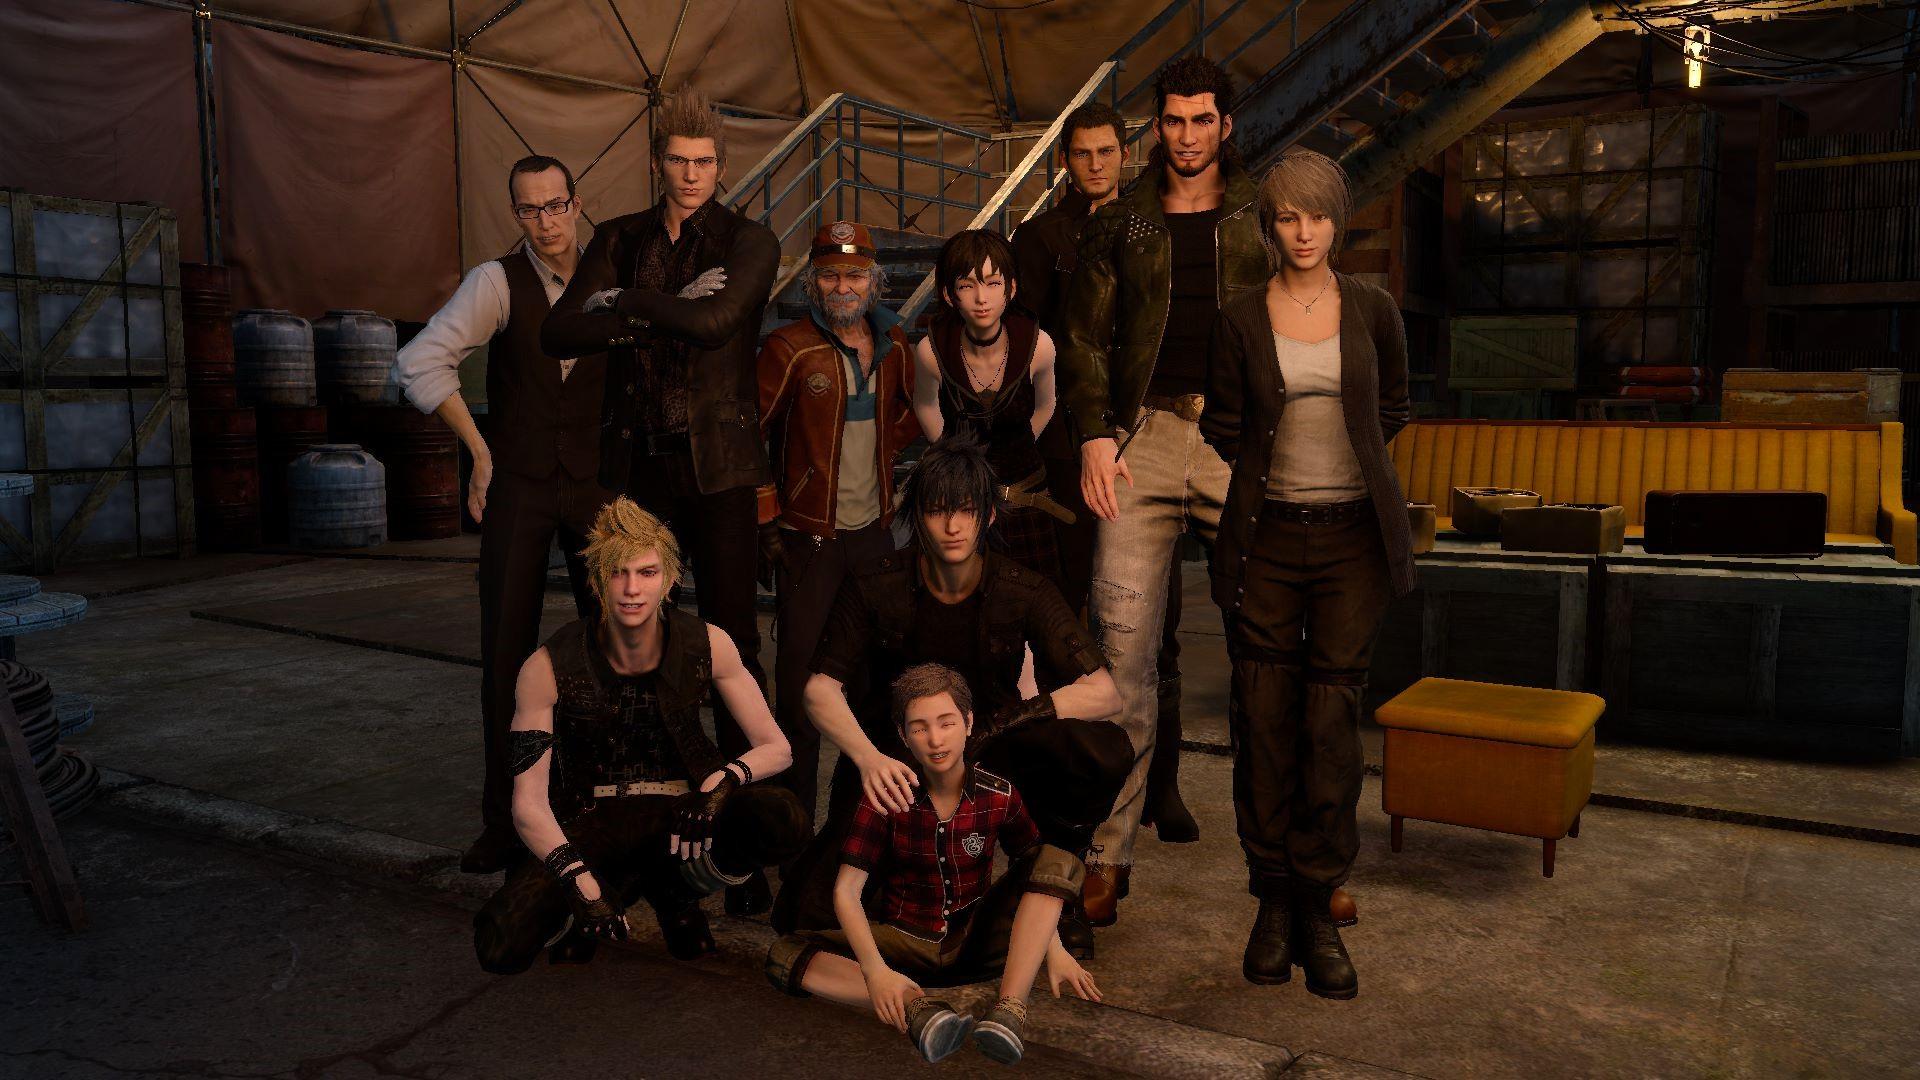 Final Fantasy, Final Fantasy XV, Noctis